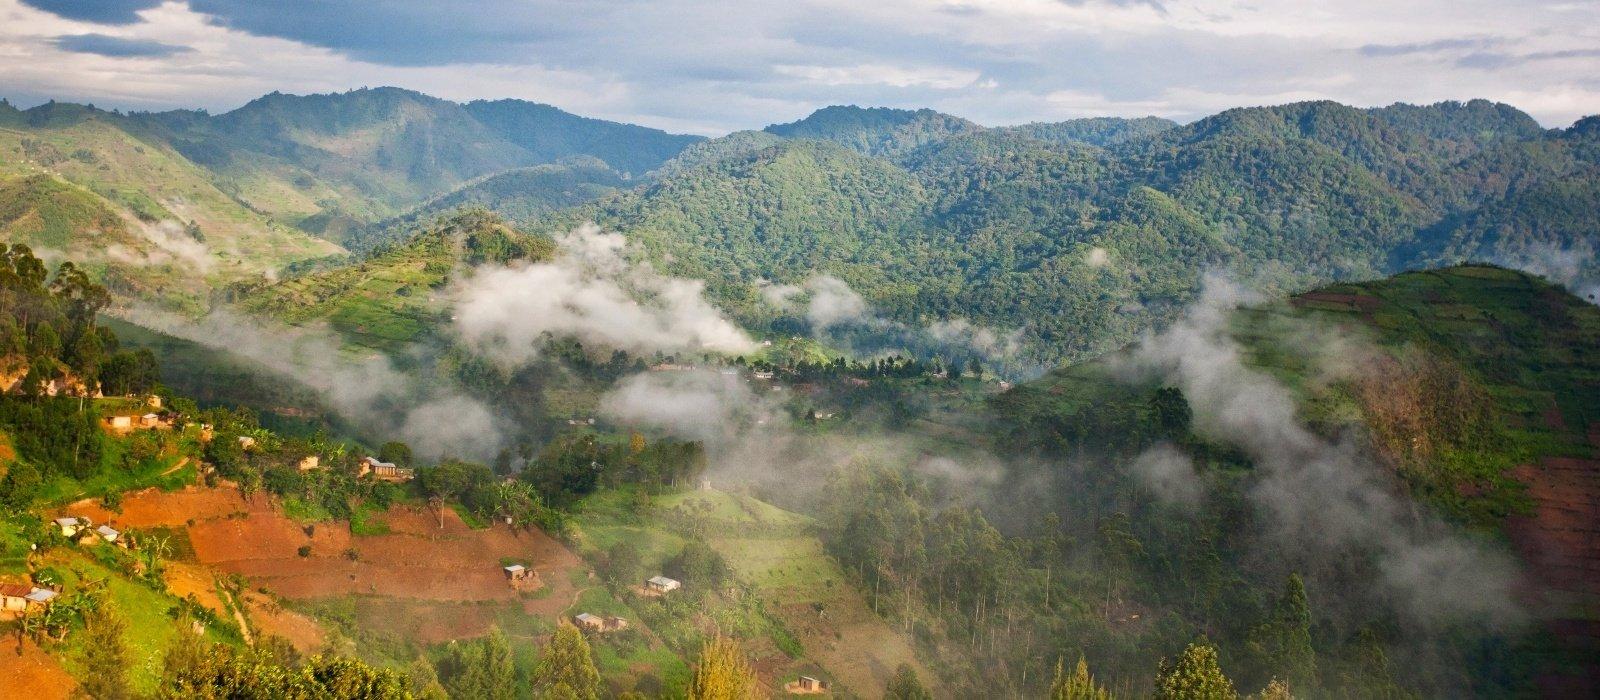 Destination Uganda Safari - Bwindi Impenetrable Forest